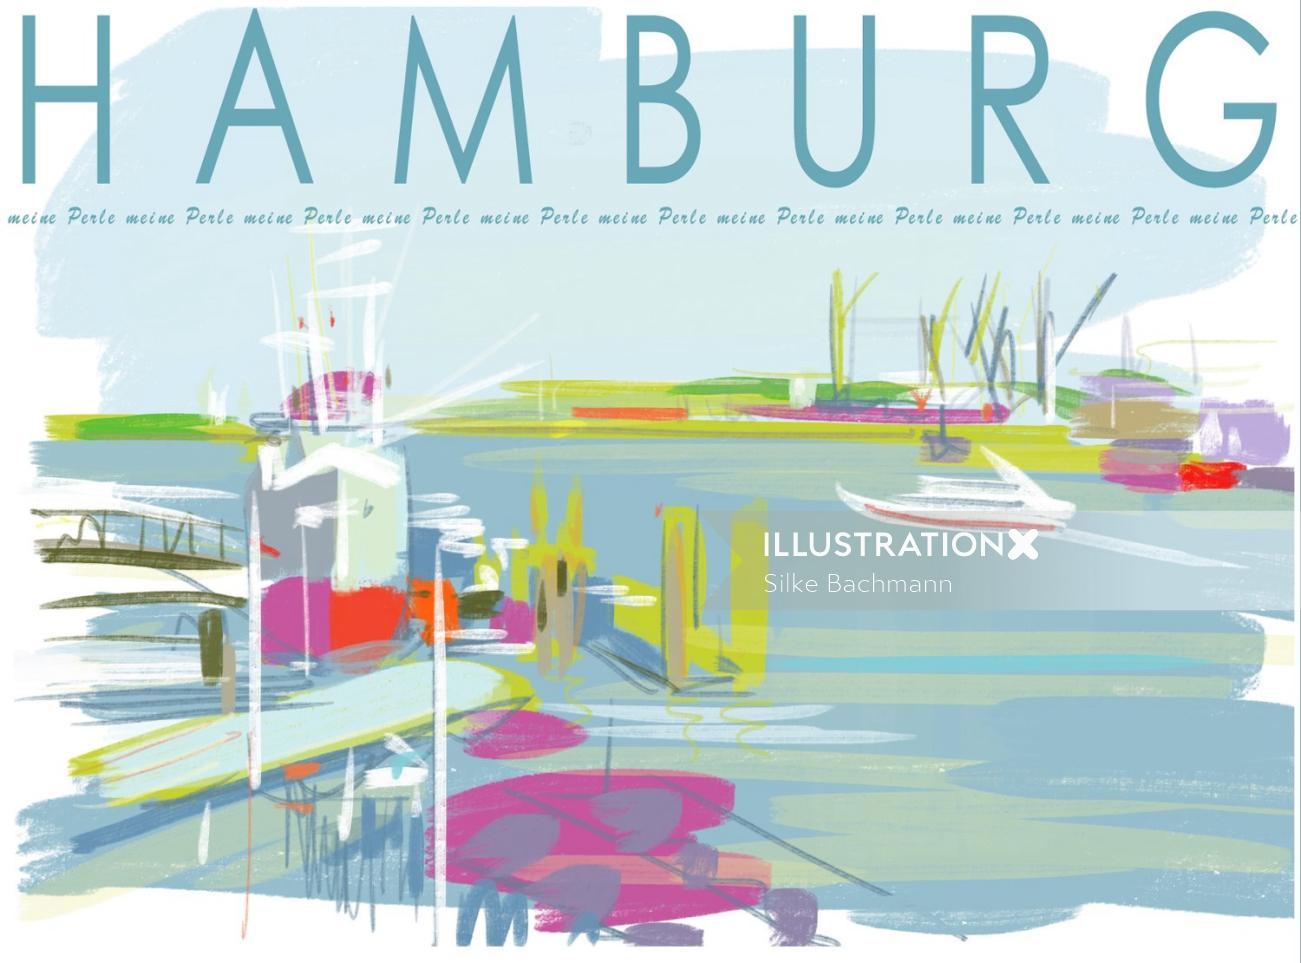 Hamburg architecture design